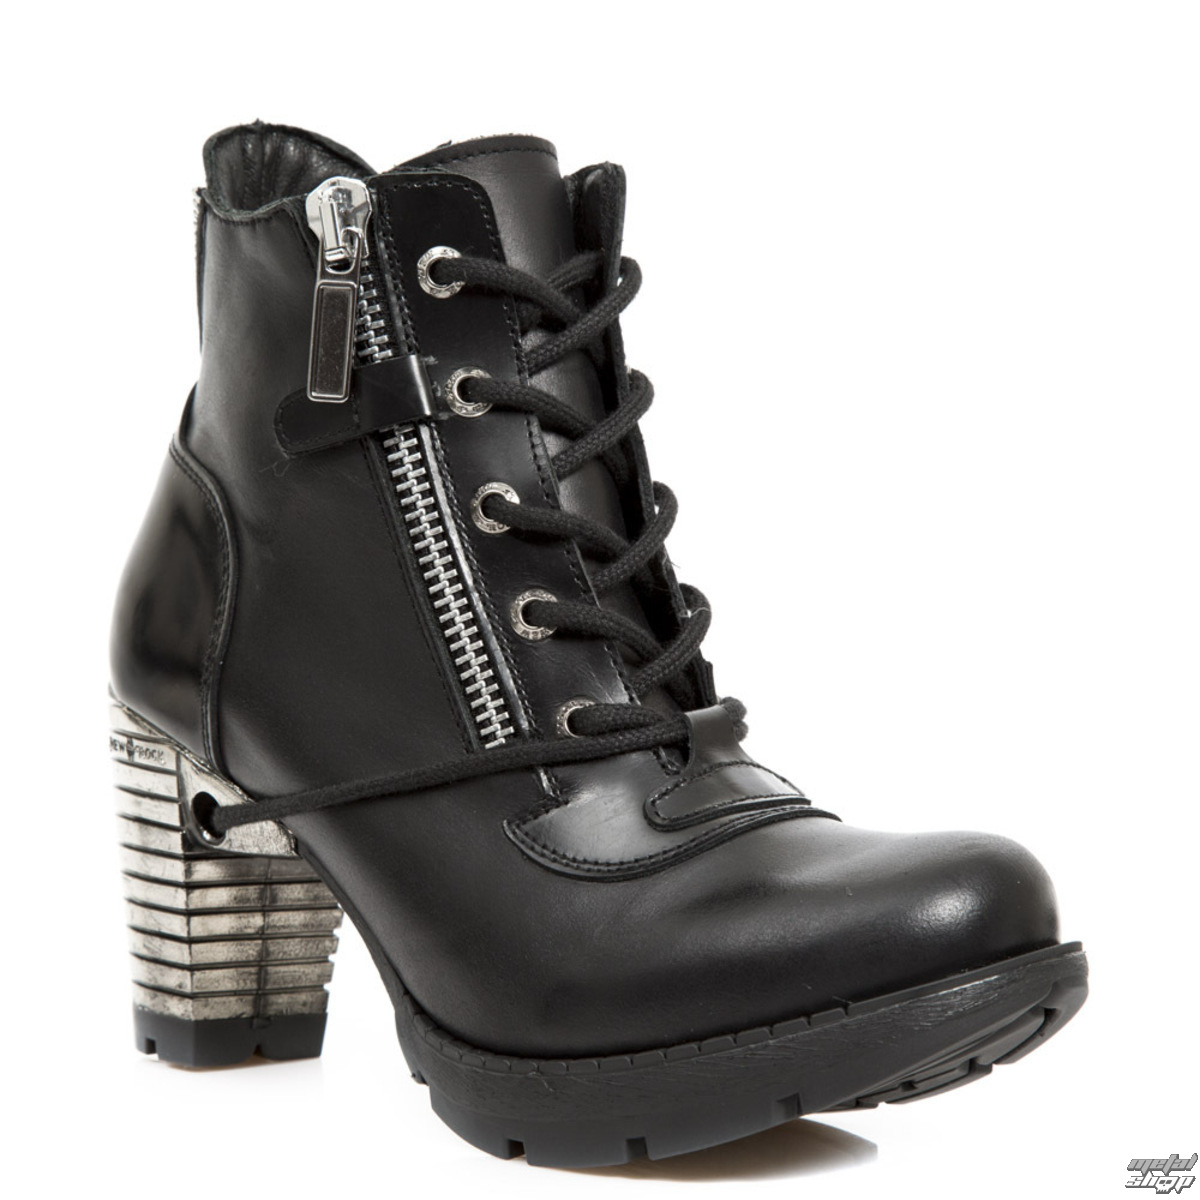 newest collection 3d875 7a1c2 high heels women's - NEW ROCK